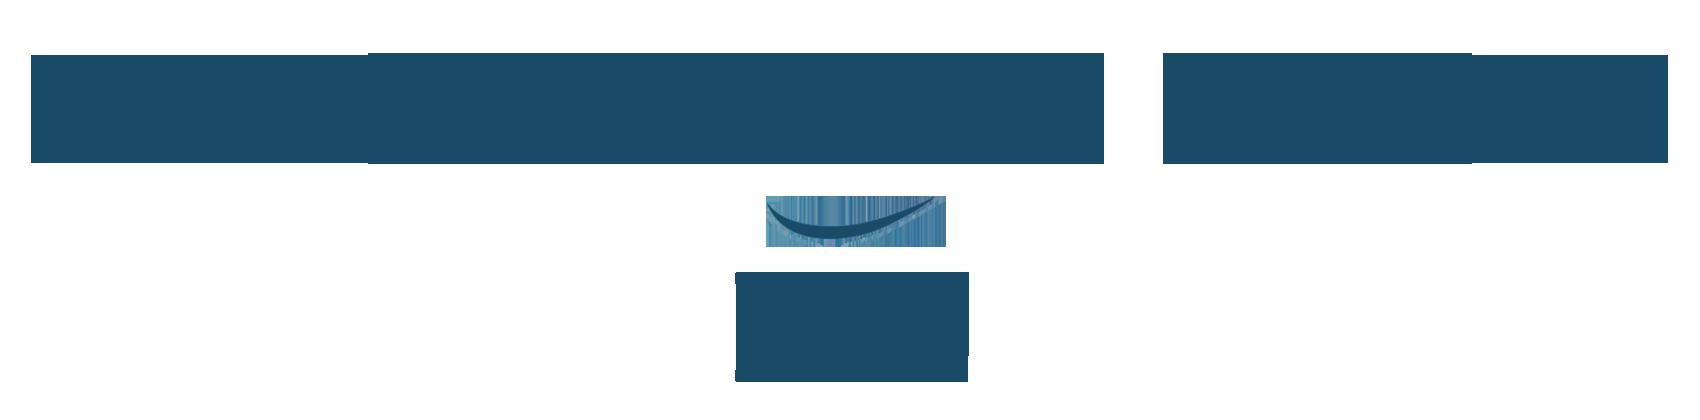 MareMonte-logo-roboto